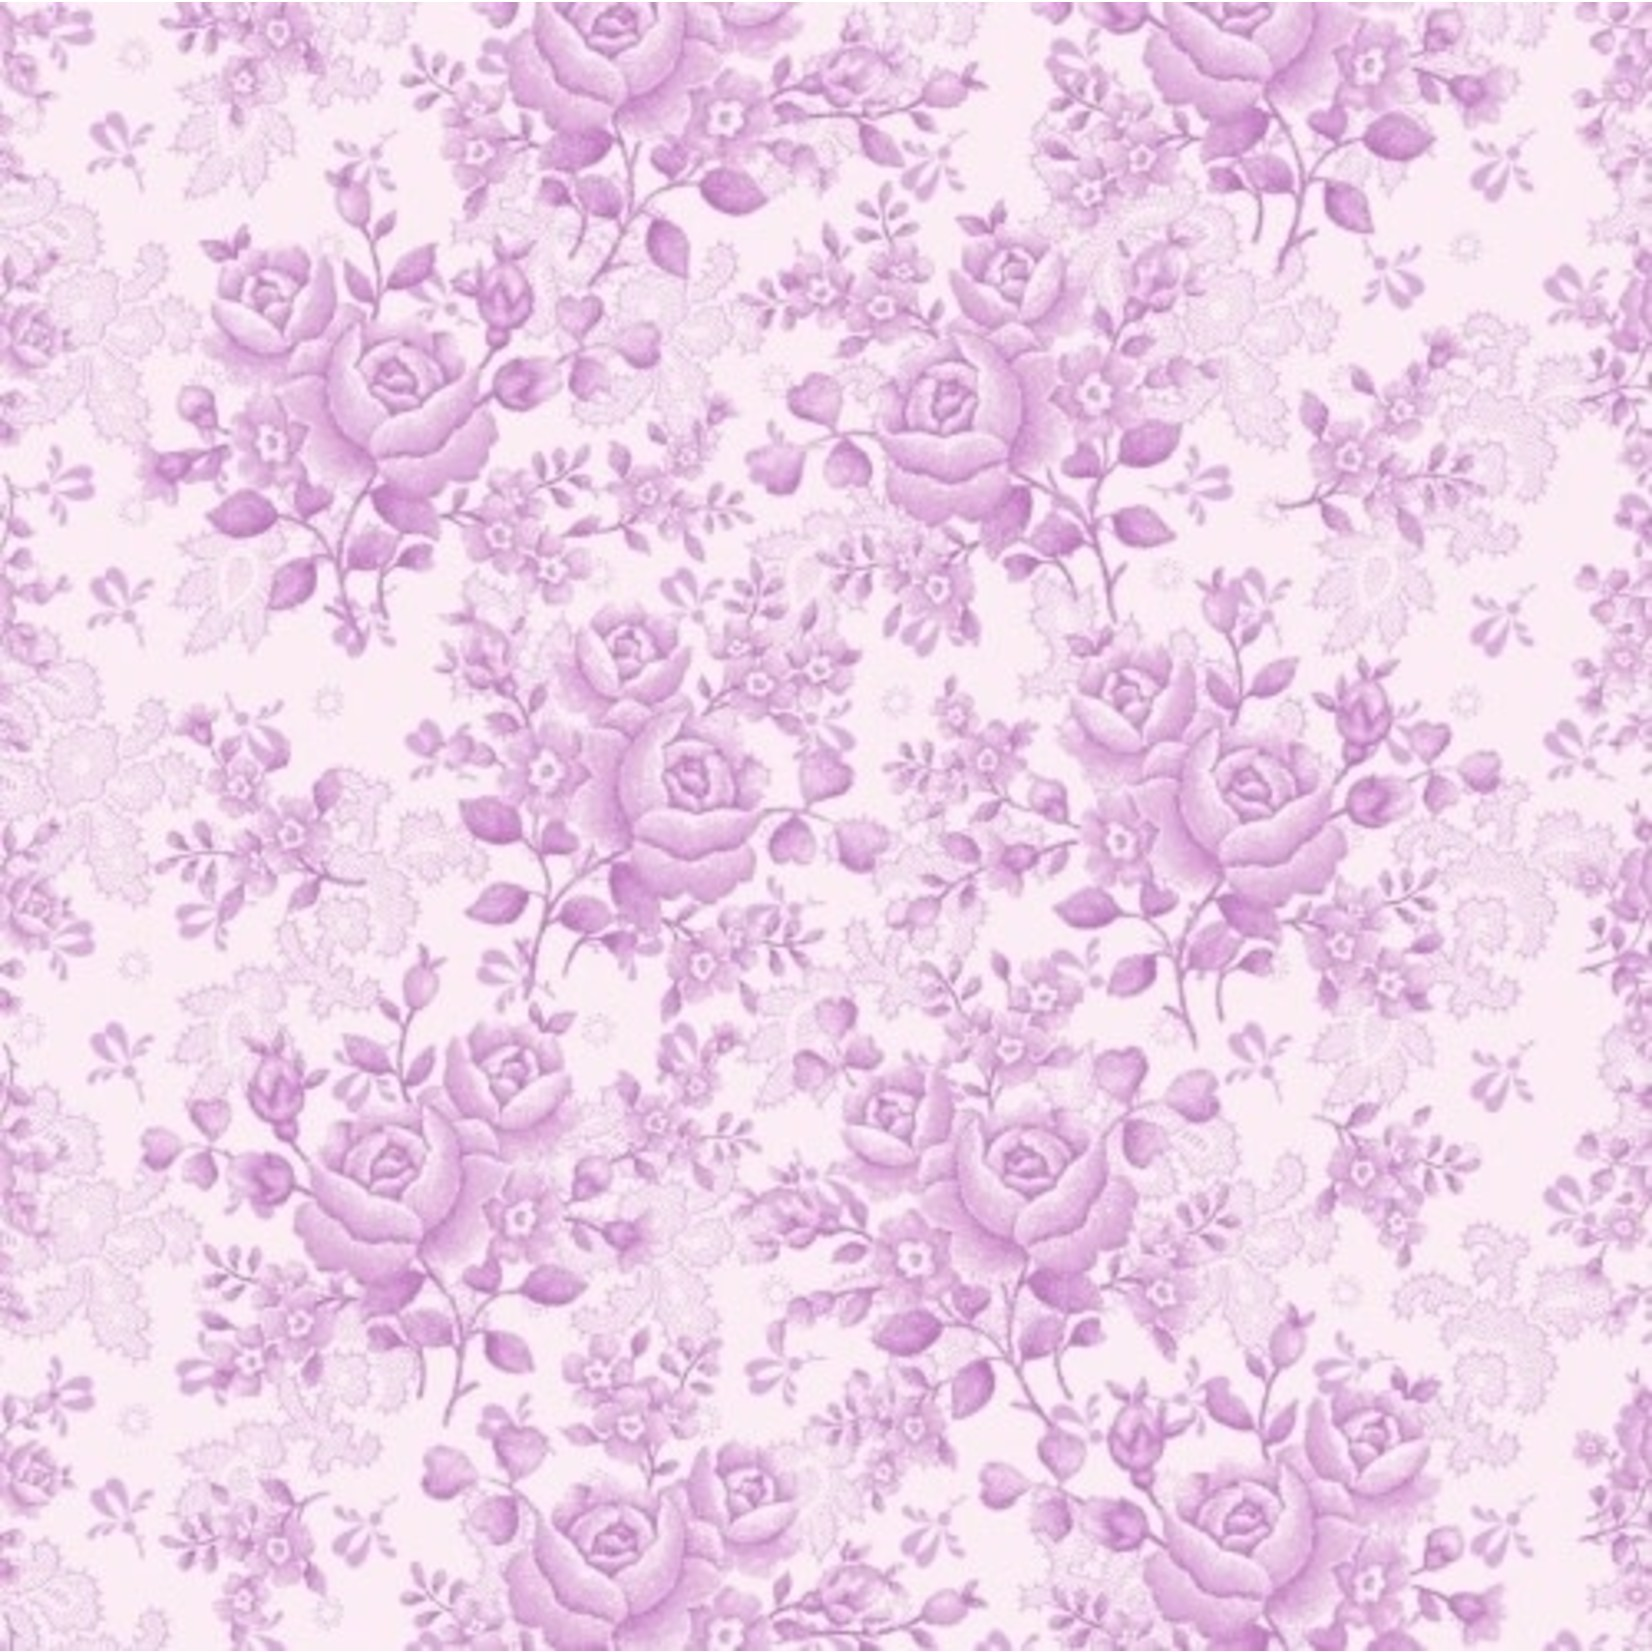 Benartex Studio Homestead Carriage - Climbing Rose - Violet